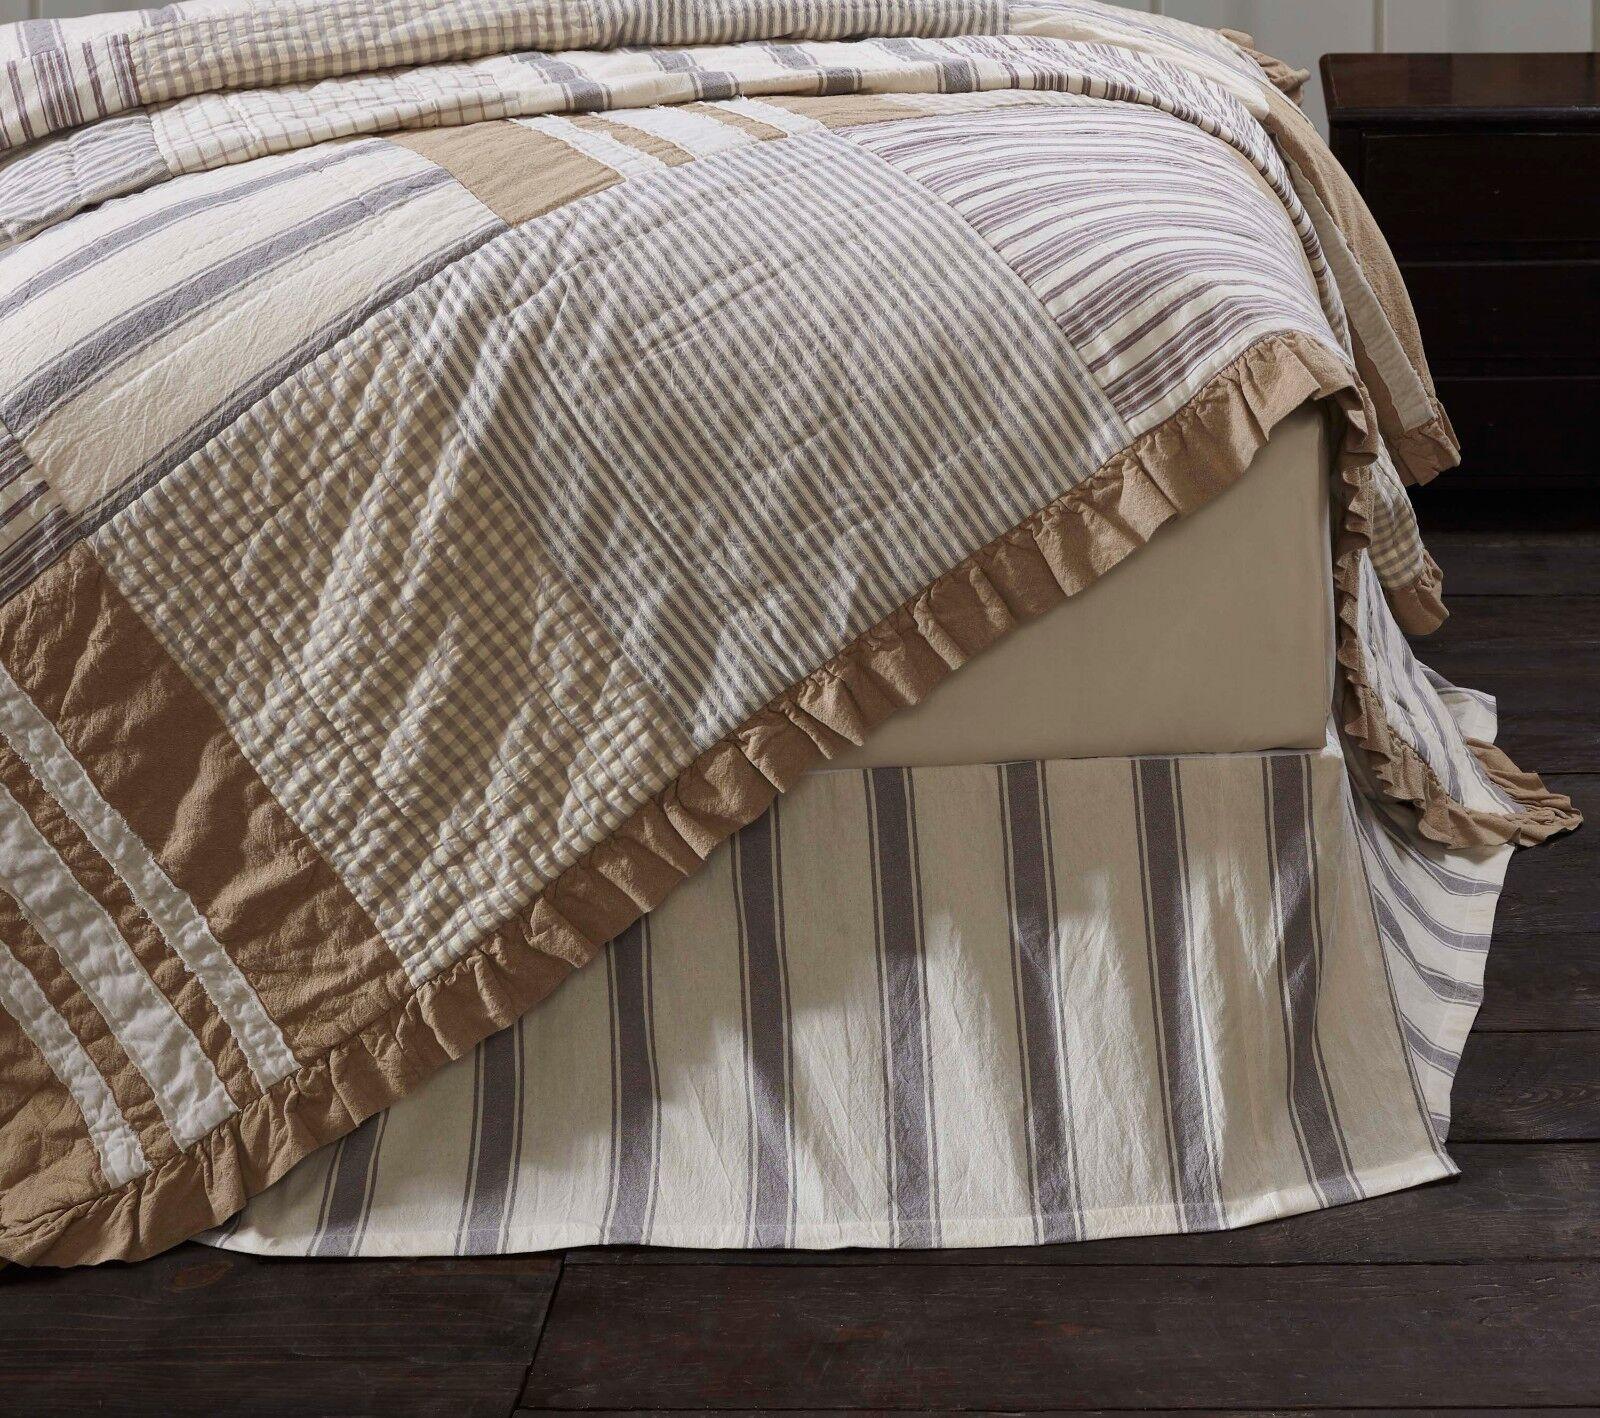 FARMHOUSE STAR TICKING STRIPE BED SKIRT Dust Ruffle Bedding Cotton VHC Brands